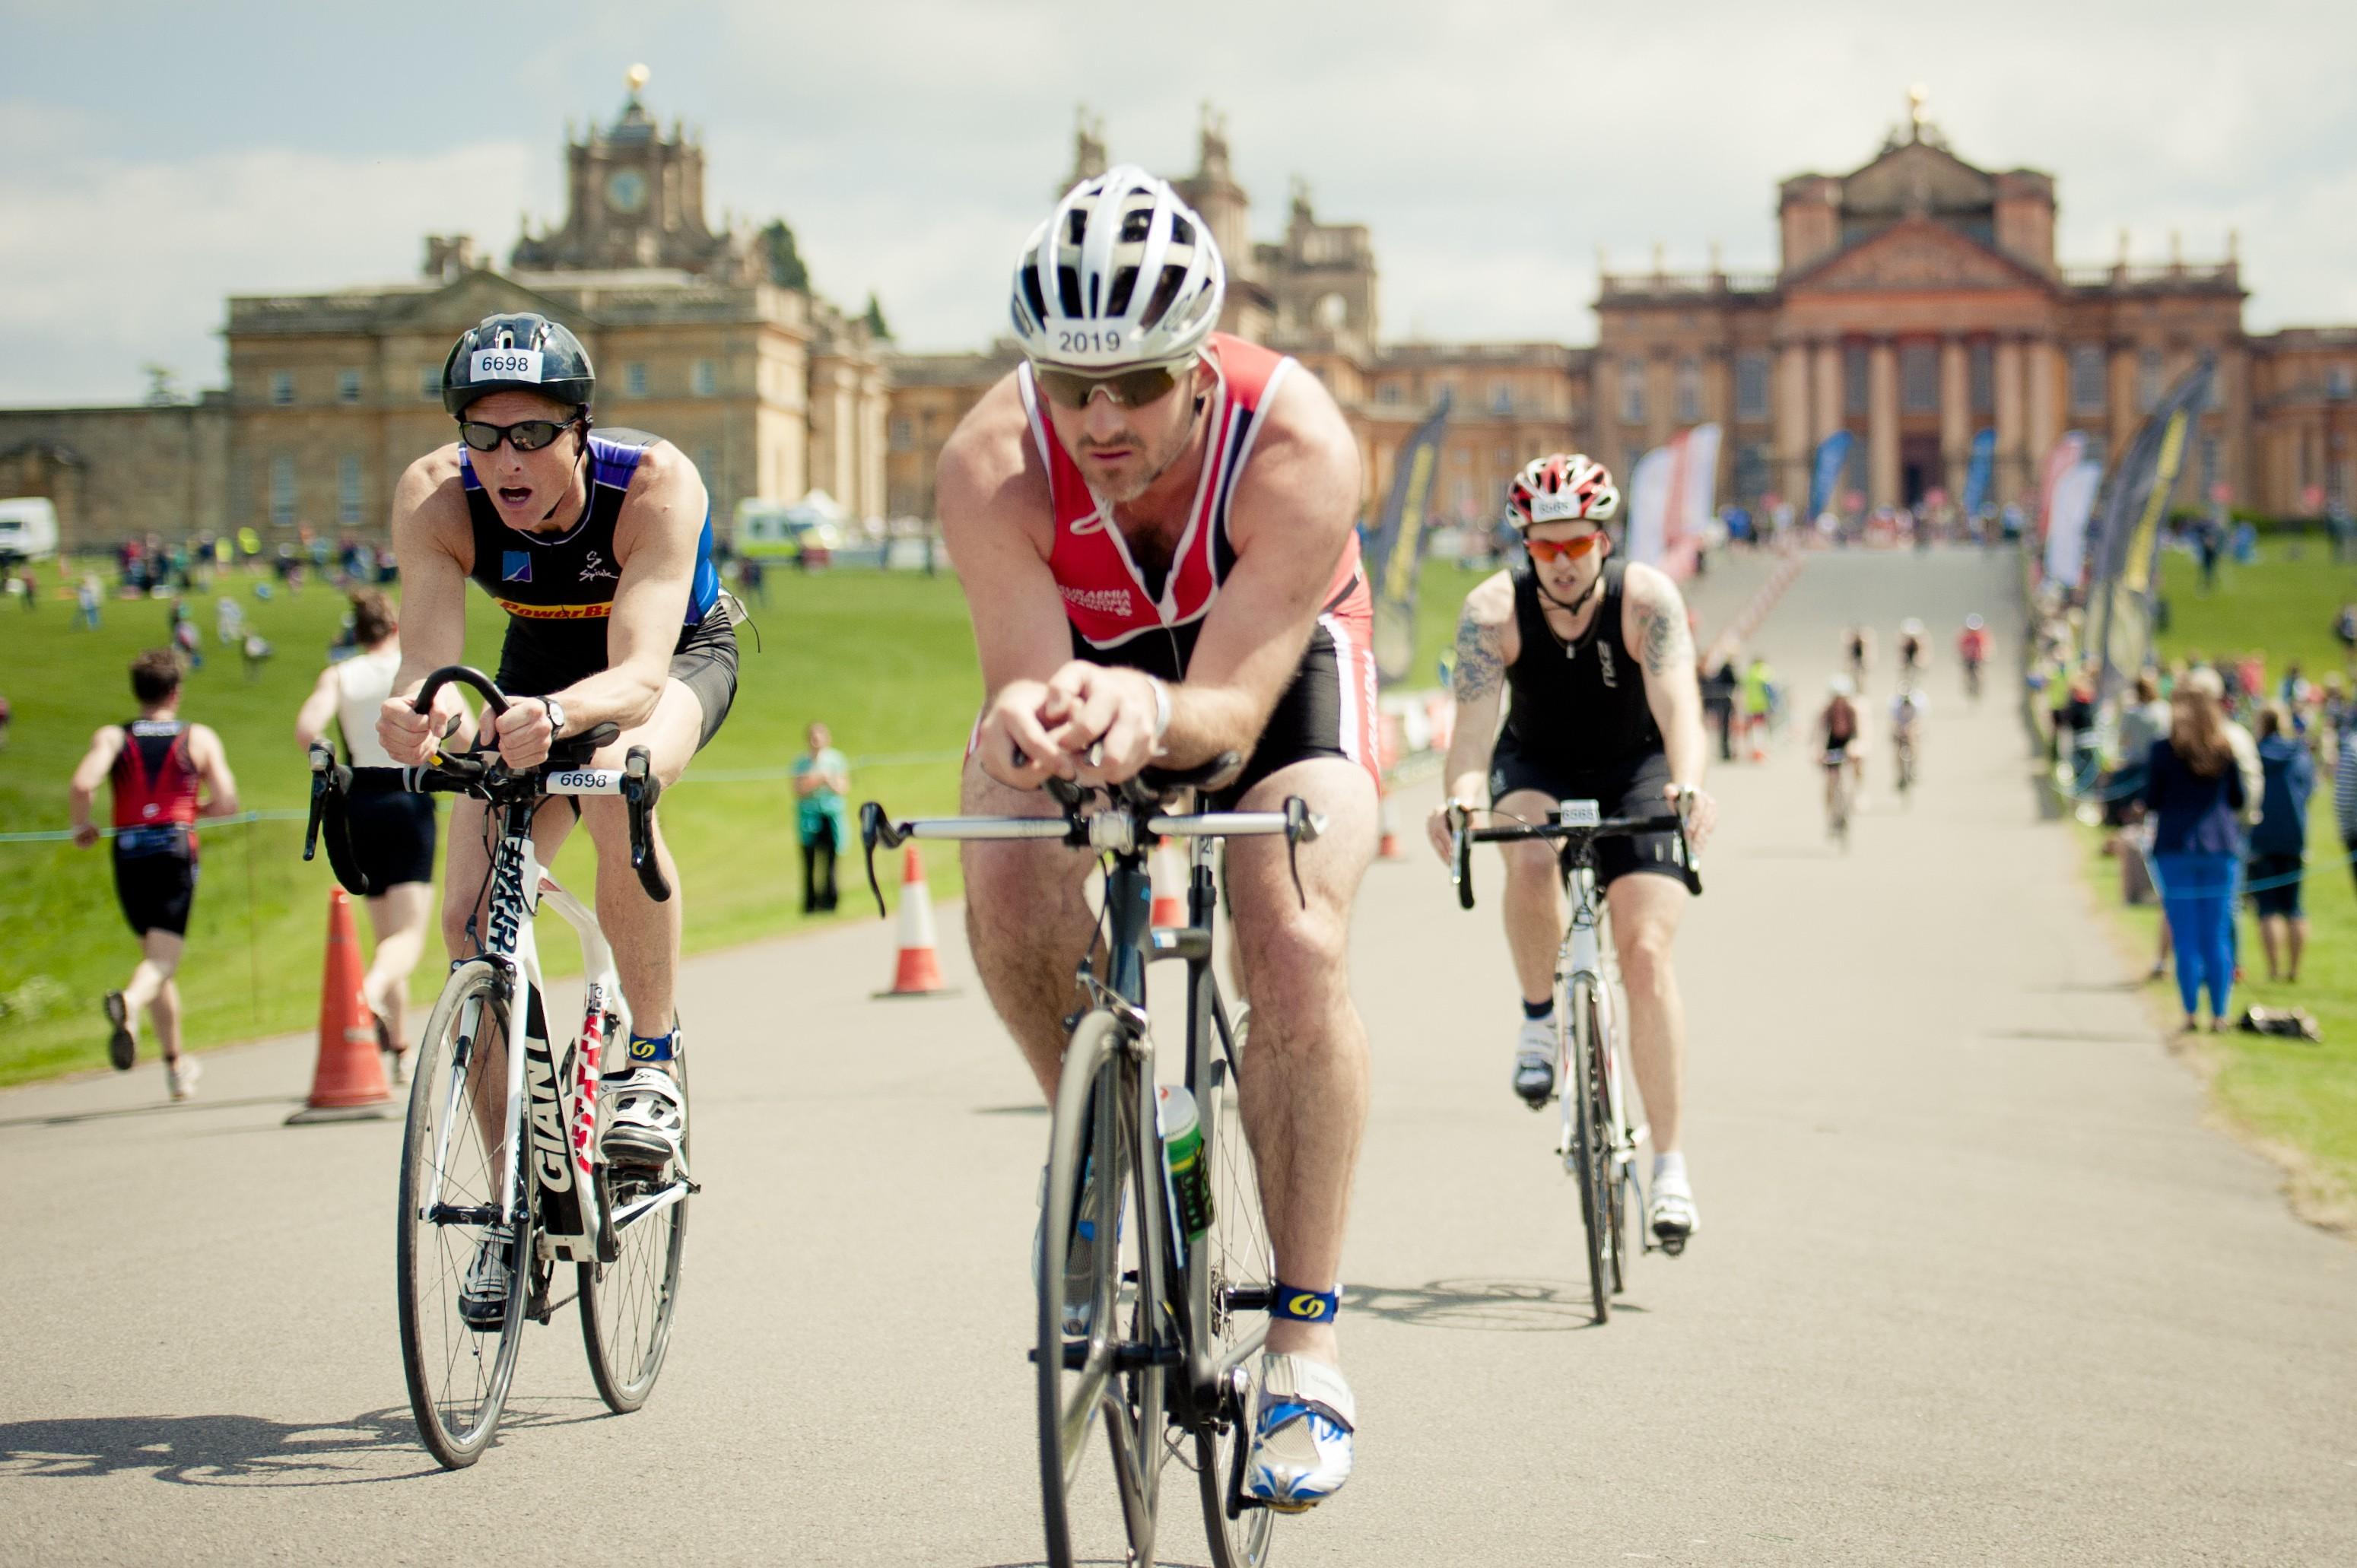 Blenheim Palace Triathlon - cover image